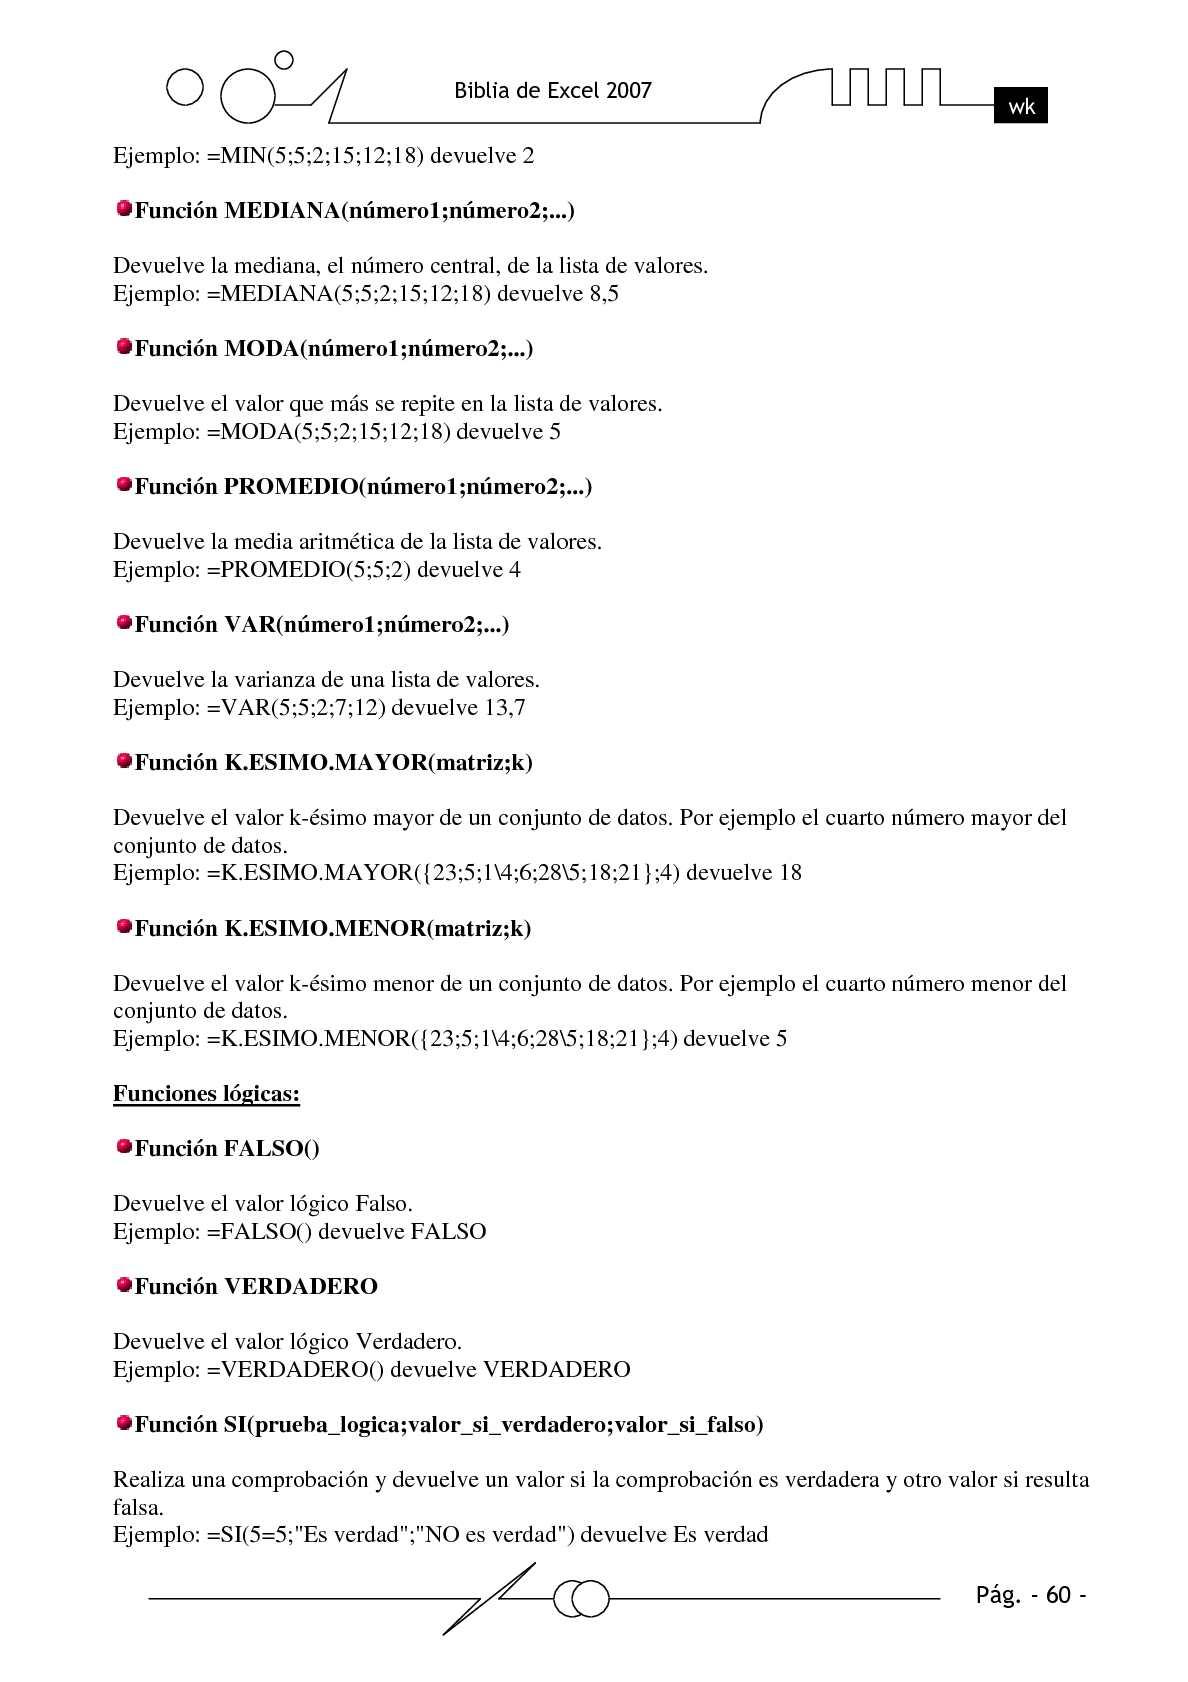 La Biblia De Excel 2007 Calameo Downloader